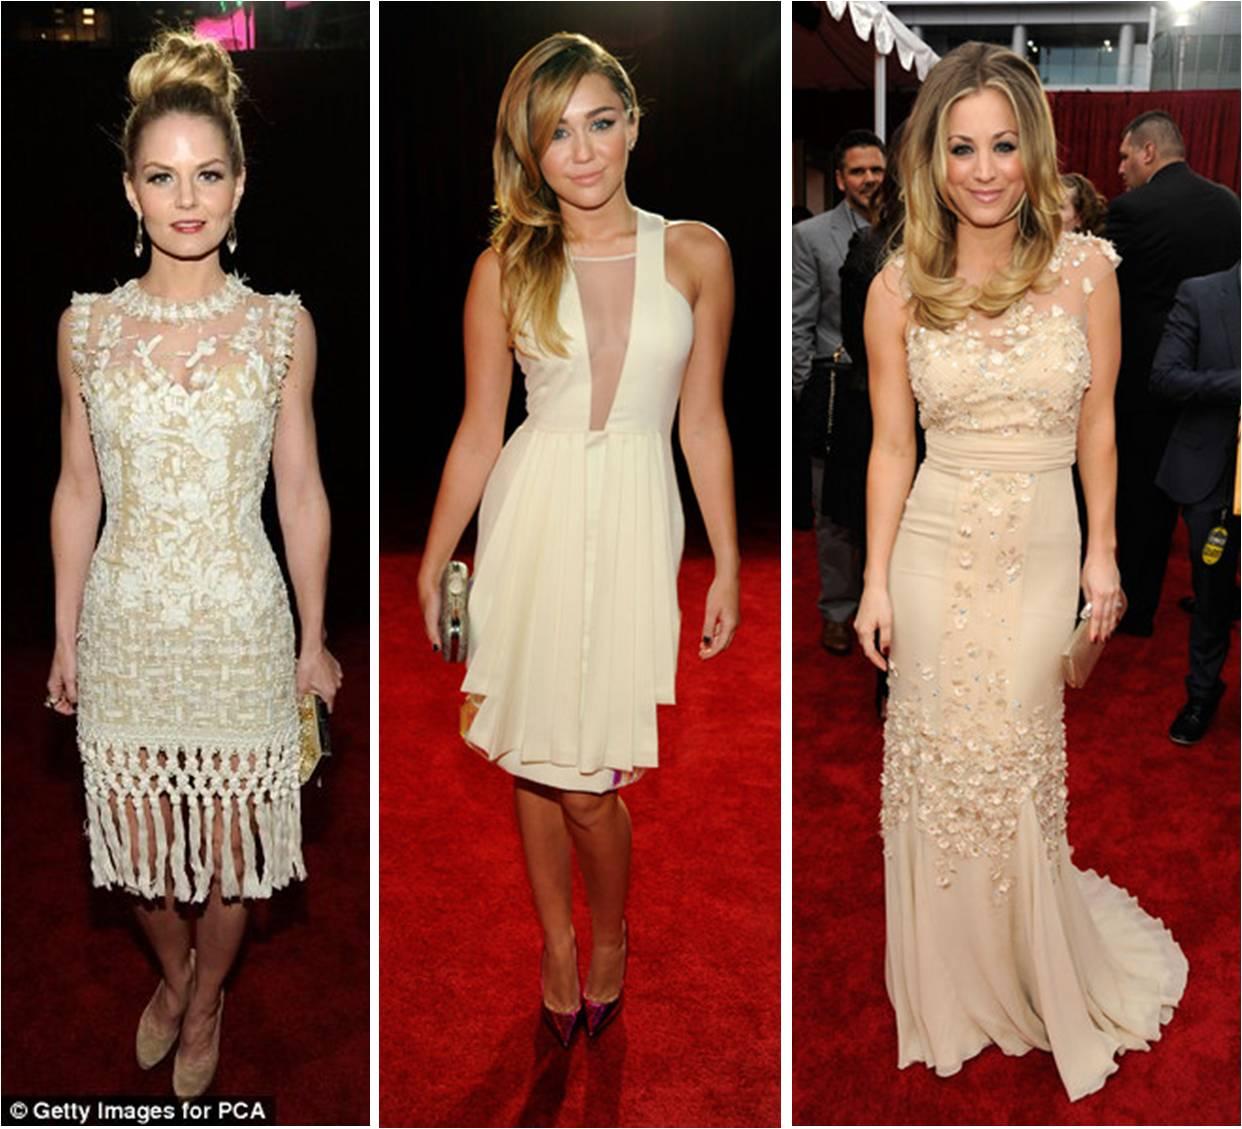 http://3.bp.blogspot.com/-unGKC7ImIOQ/Tw6TbaUuhNI/AAAAAAAAIbU/SrA34OLCnko/s1600/2012+Peoples+Choice+Awards+Best+Dressed+Jennifer+Morrison+Mylie+Cyrus+Kelly+Kuoco.jpg